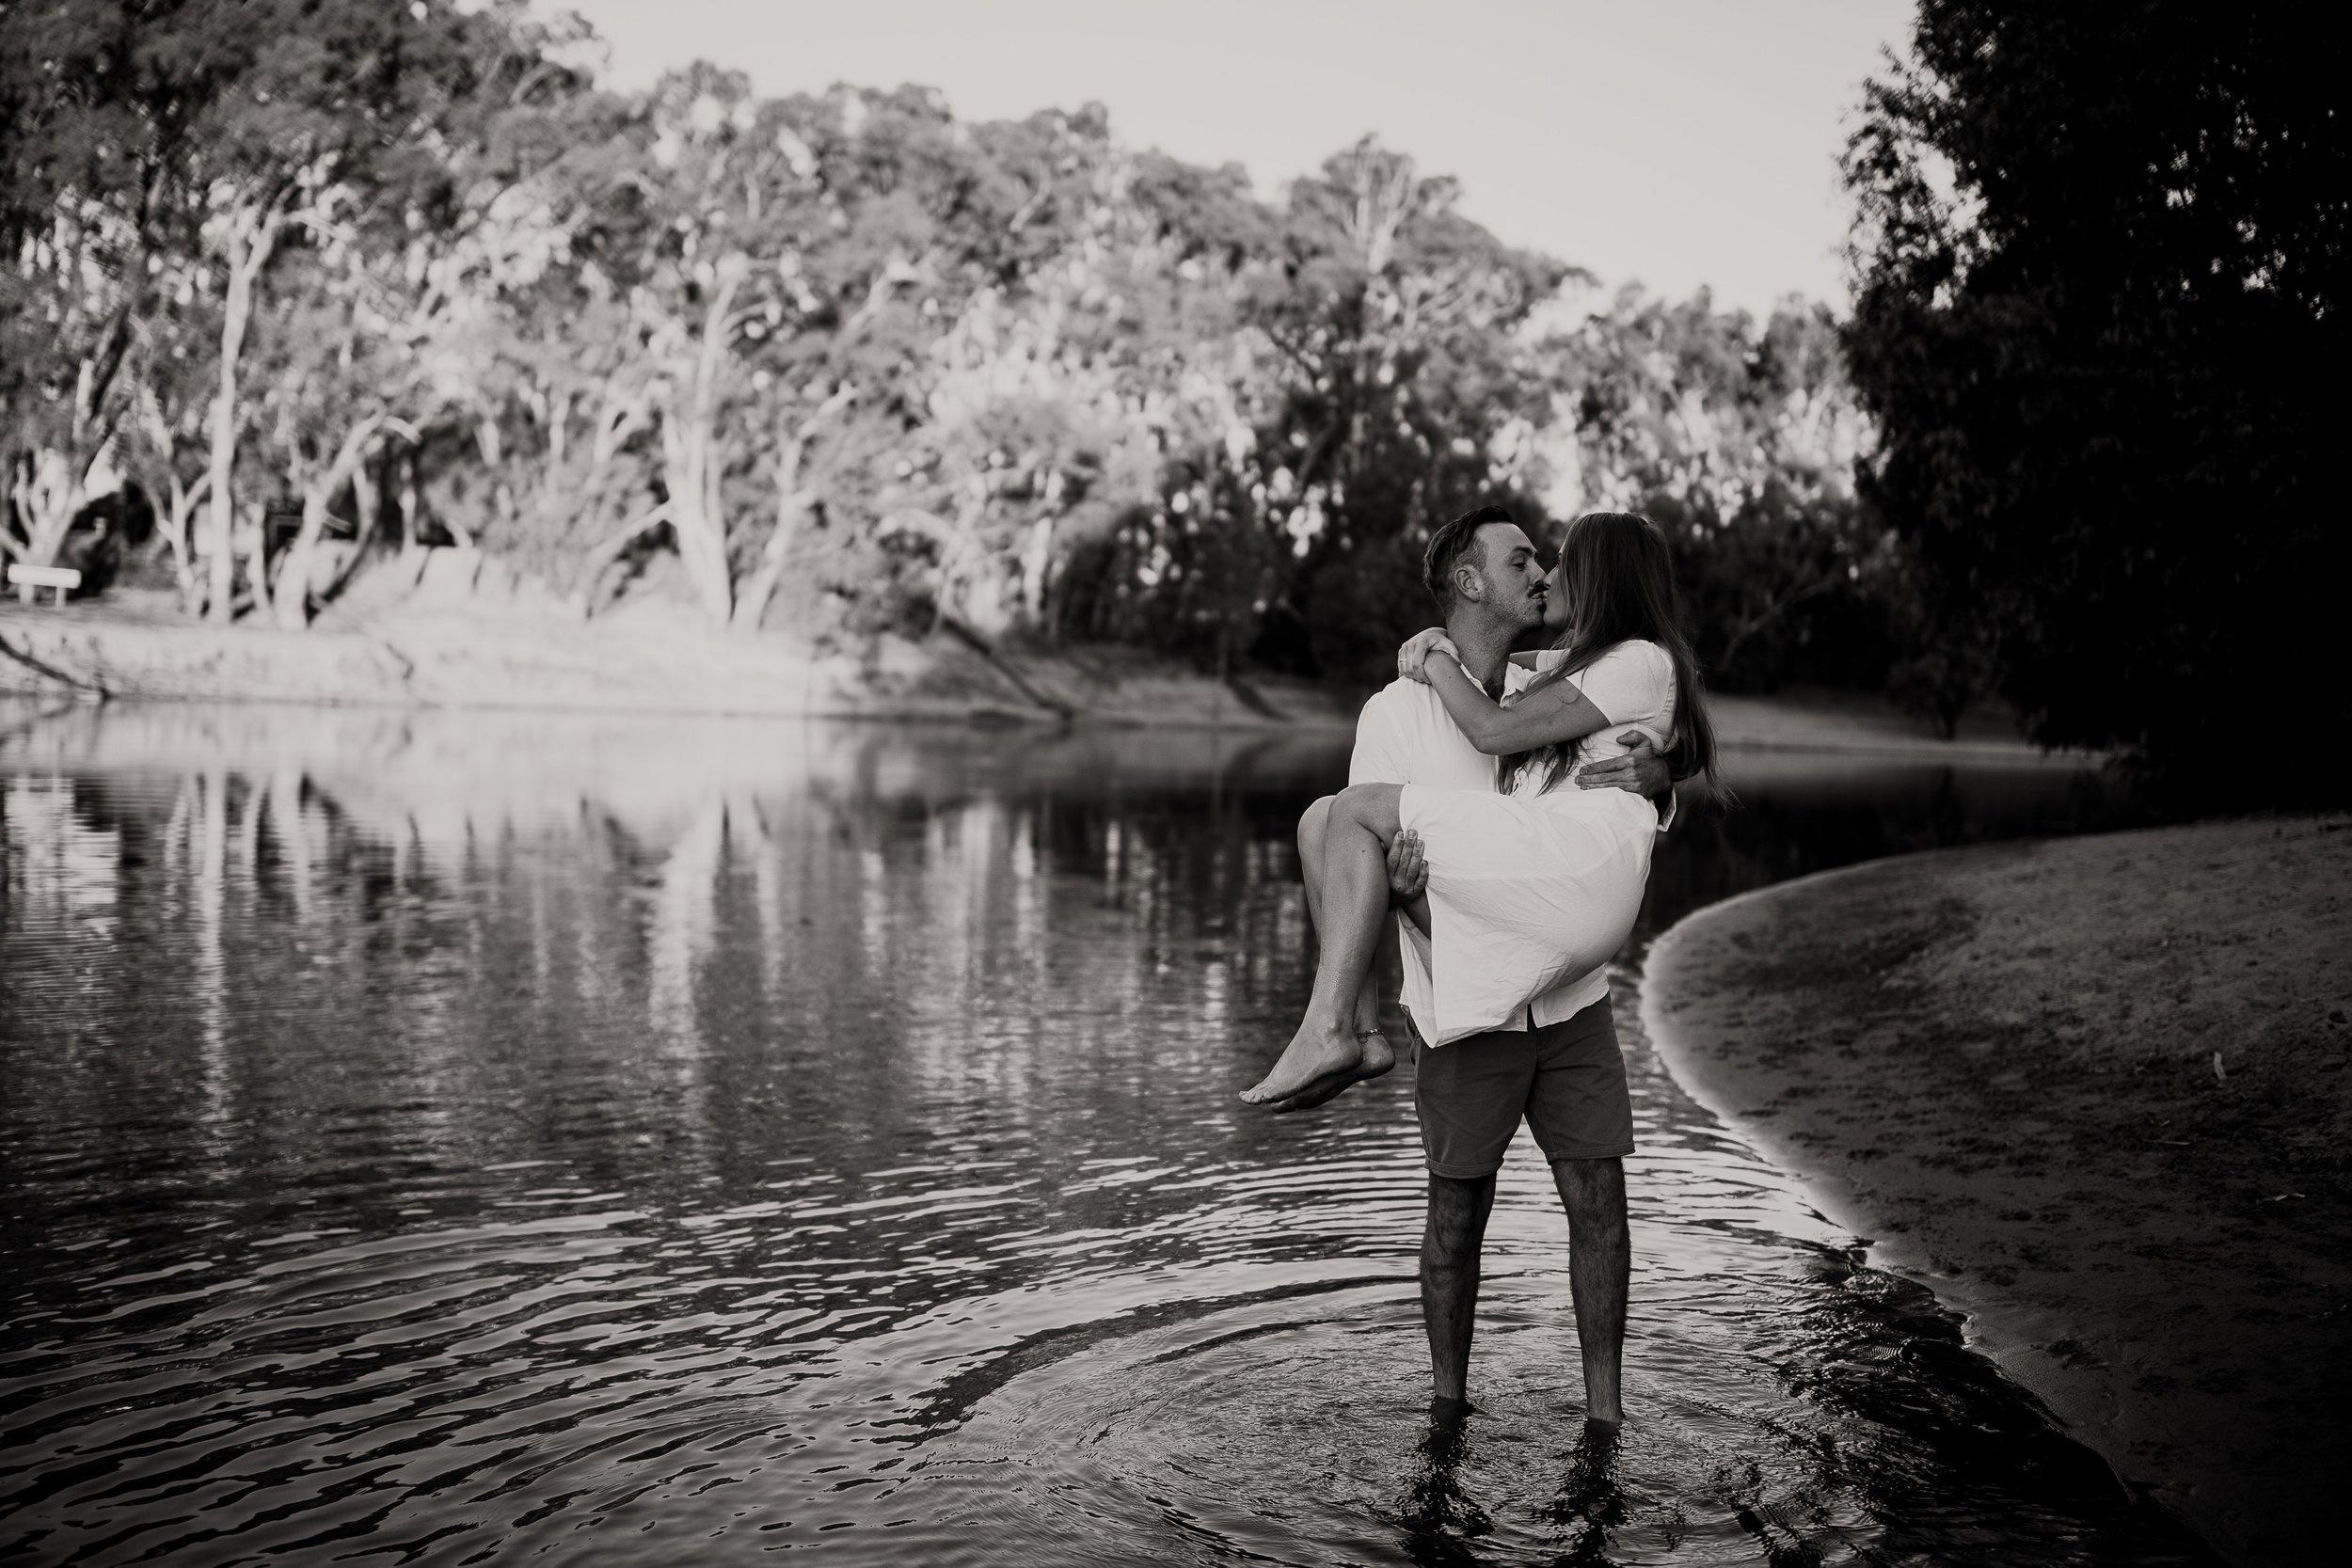 mickalathomas_puremacphotography_weddingphotographer_couplephotographer_Sheppartonphotographer_2836.jpg